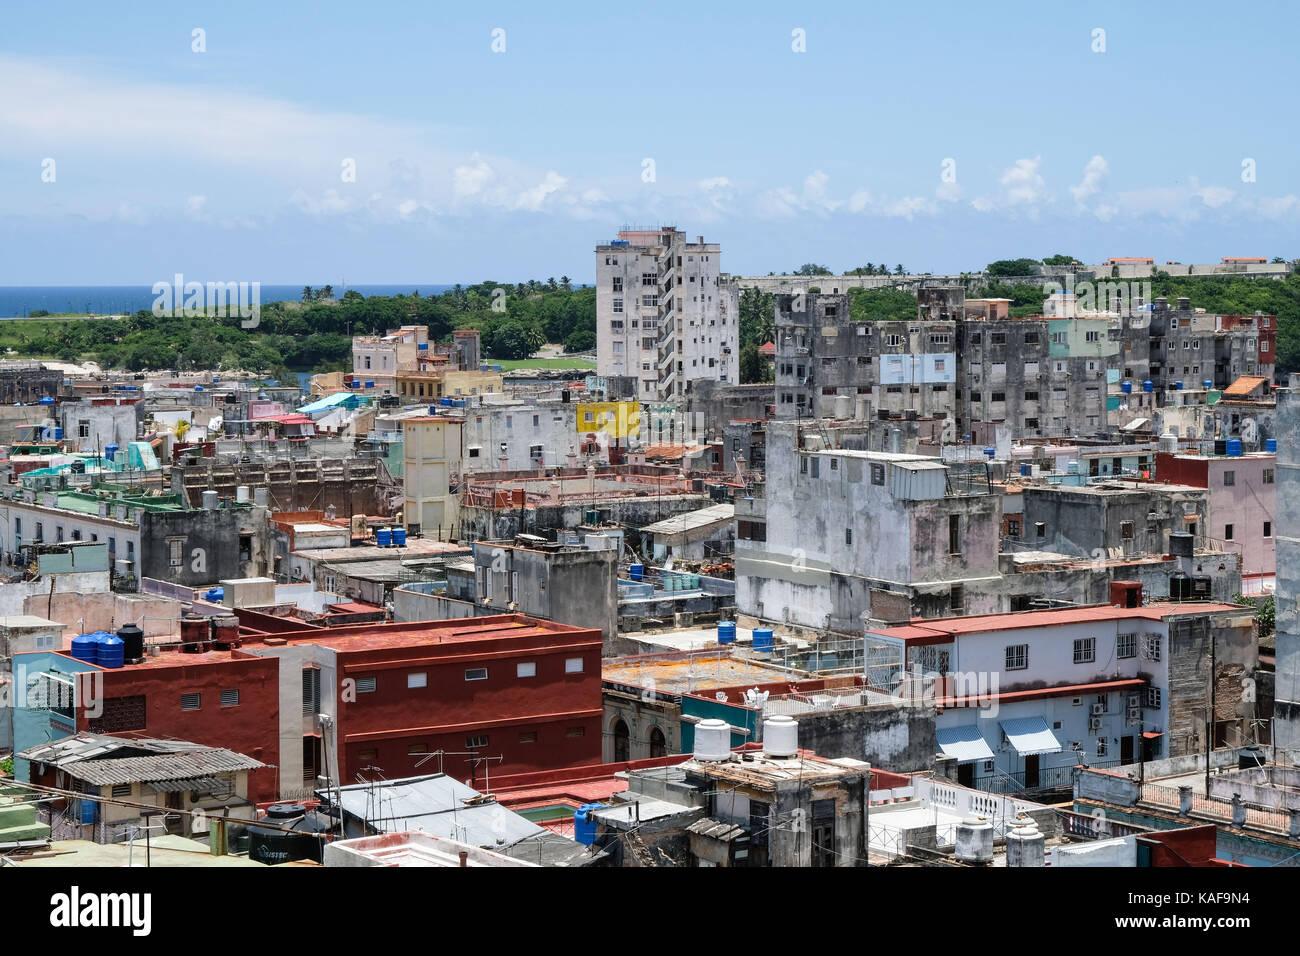 The view over the rooftops of Centro Habana and Habana Vieja in Havana, Cuba. - Stock Image